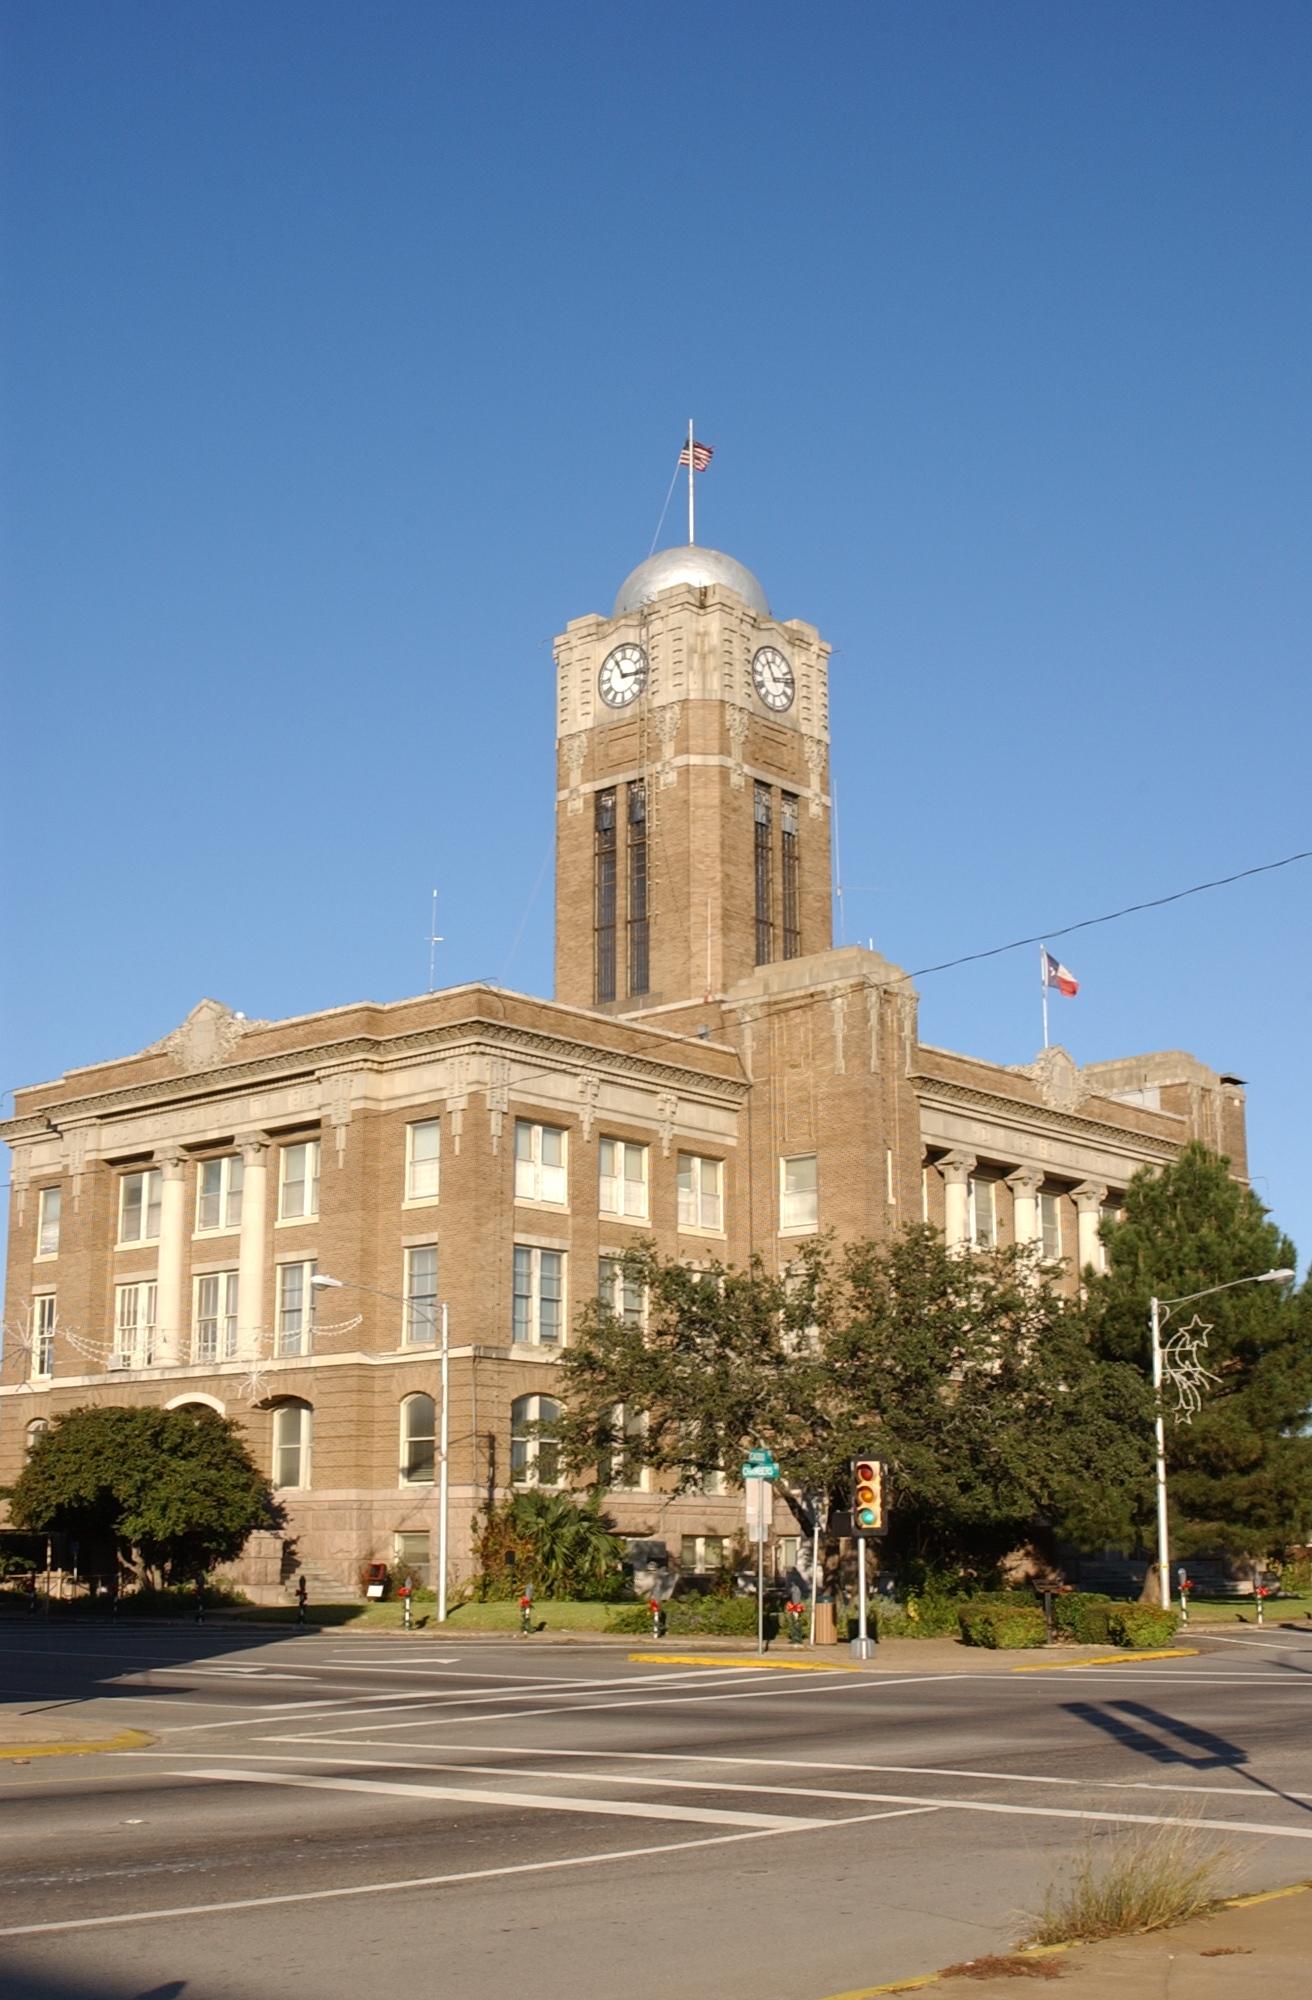 Courthouse-Exterior.JPG